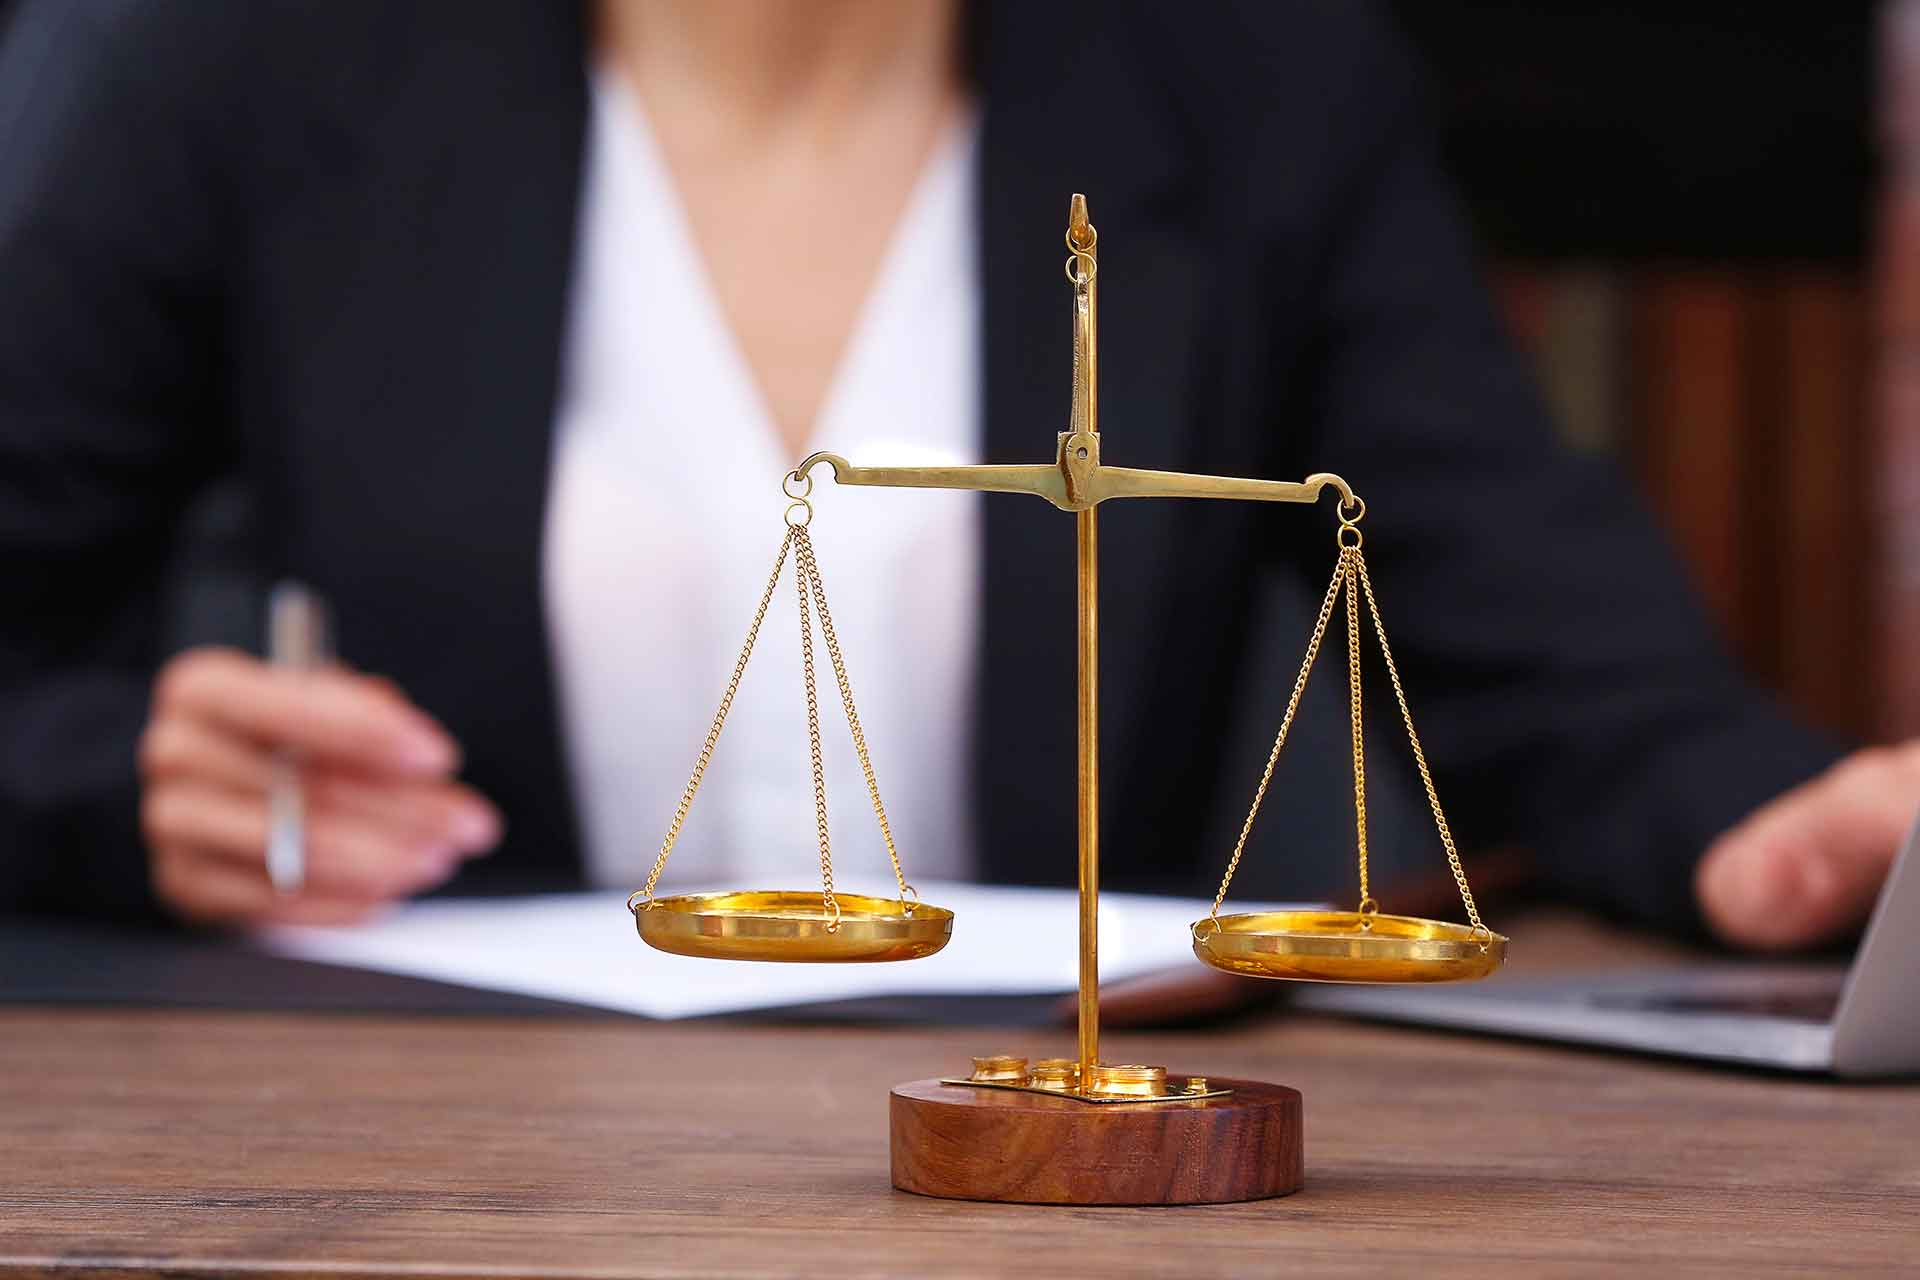 Oriëntatiepunten voor straftoemeting en lovs-afspraken strafrecht advocaat - Weening Strafrechtadvocaten